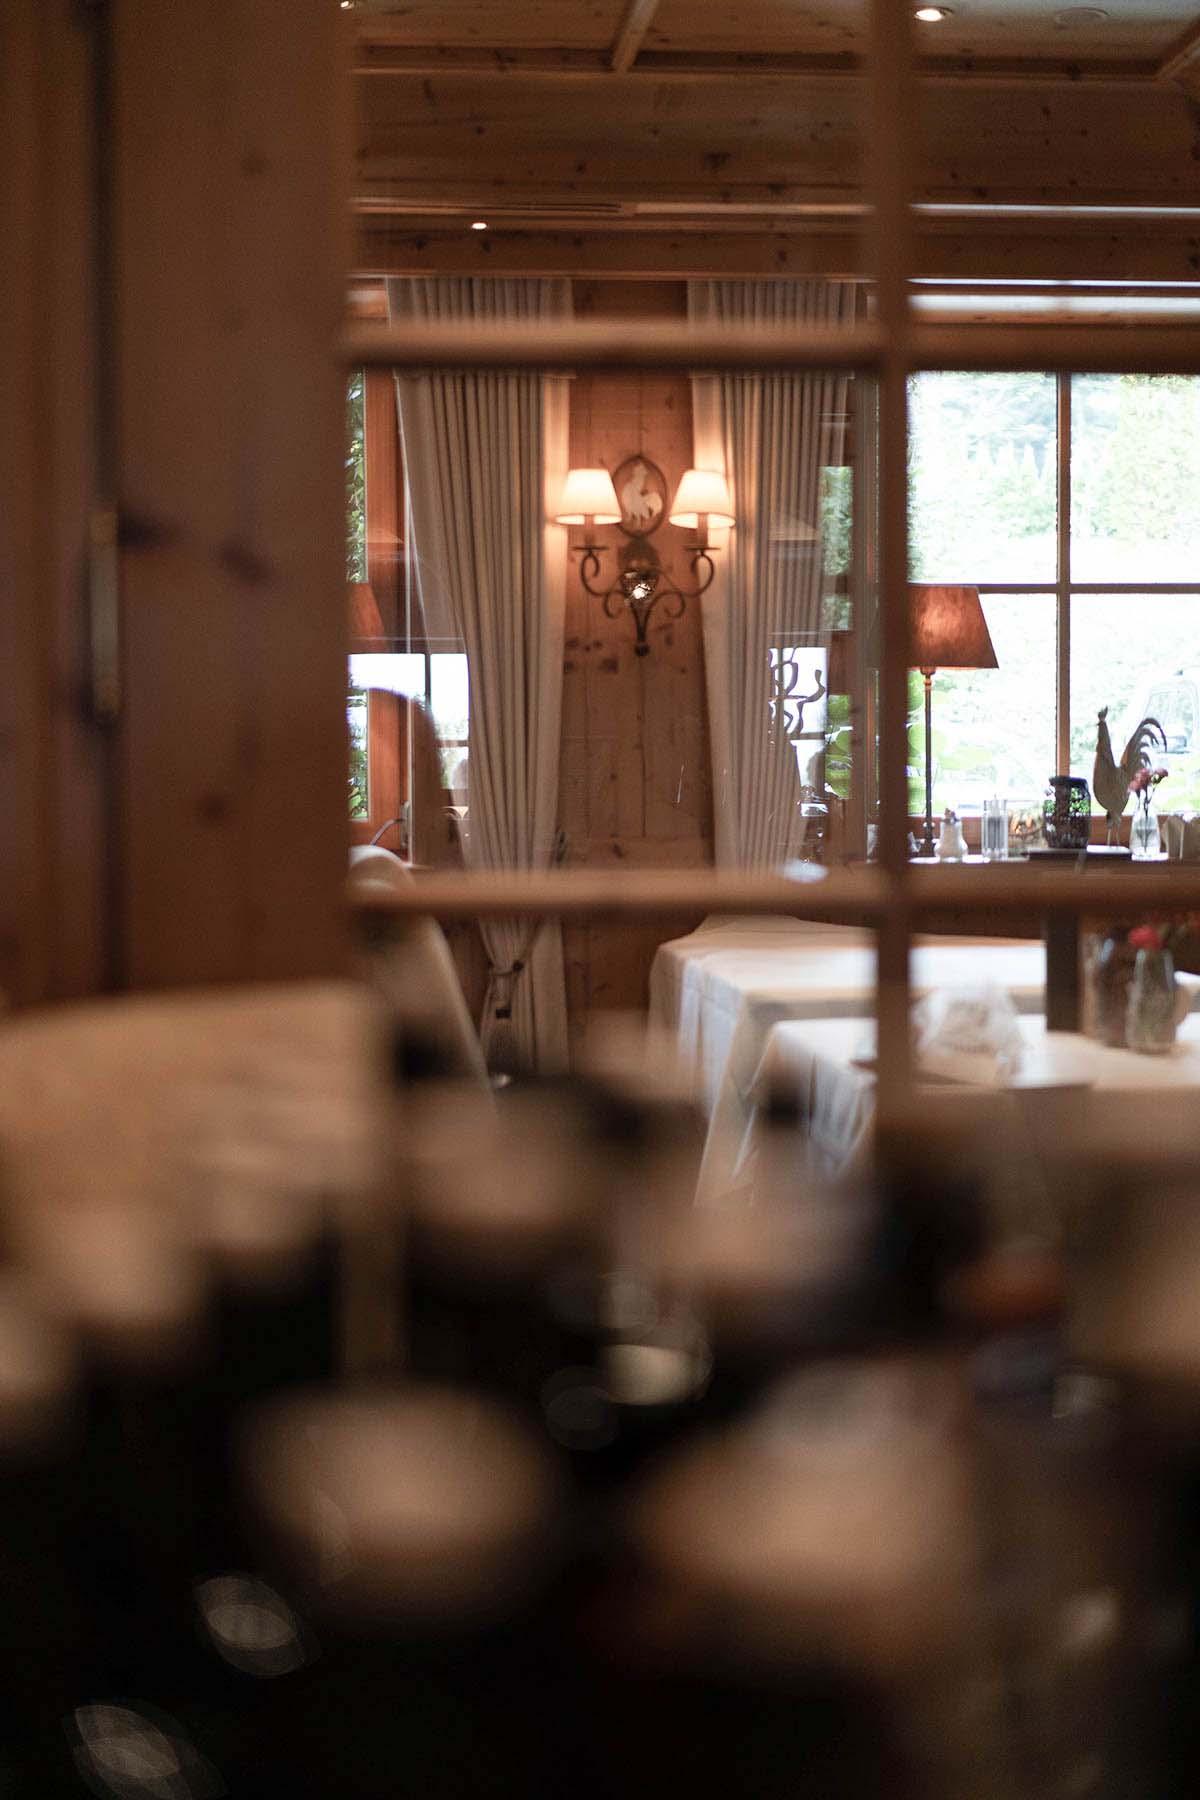 wellnesshotel-bayerwaldhof-restaurant-1